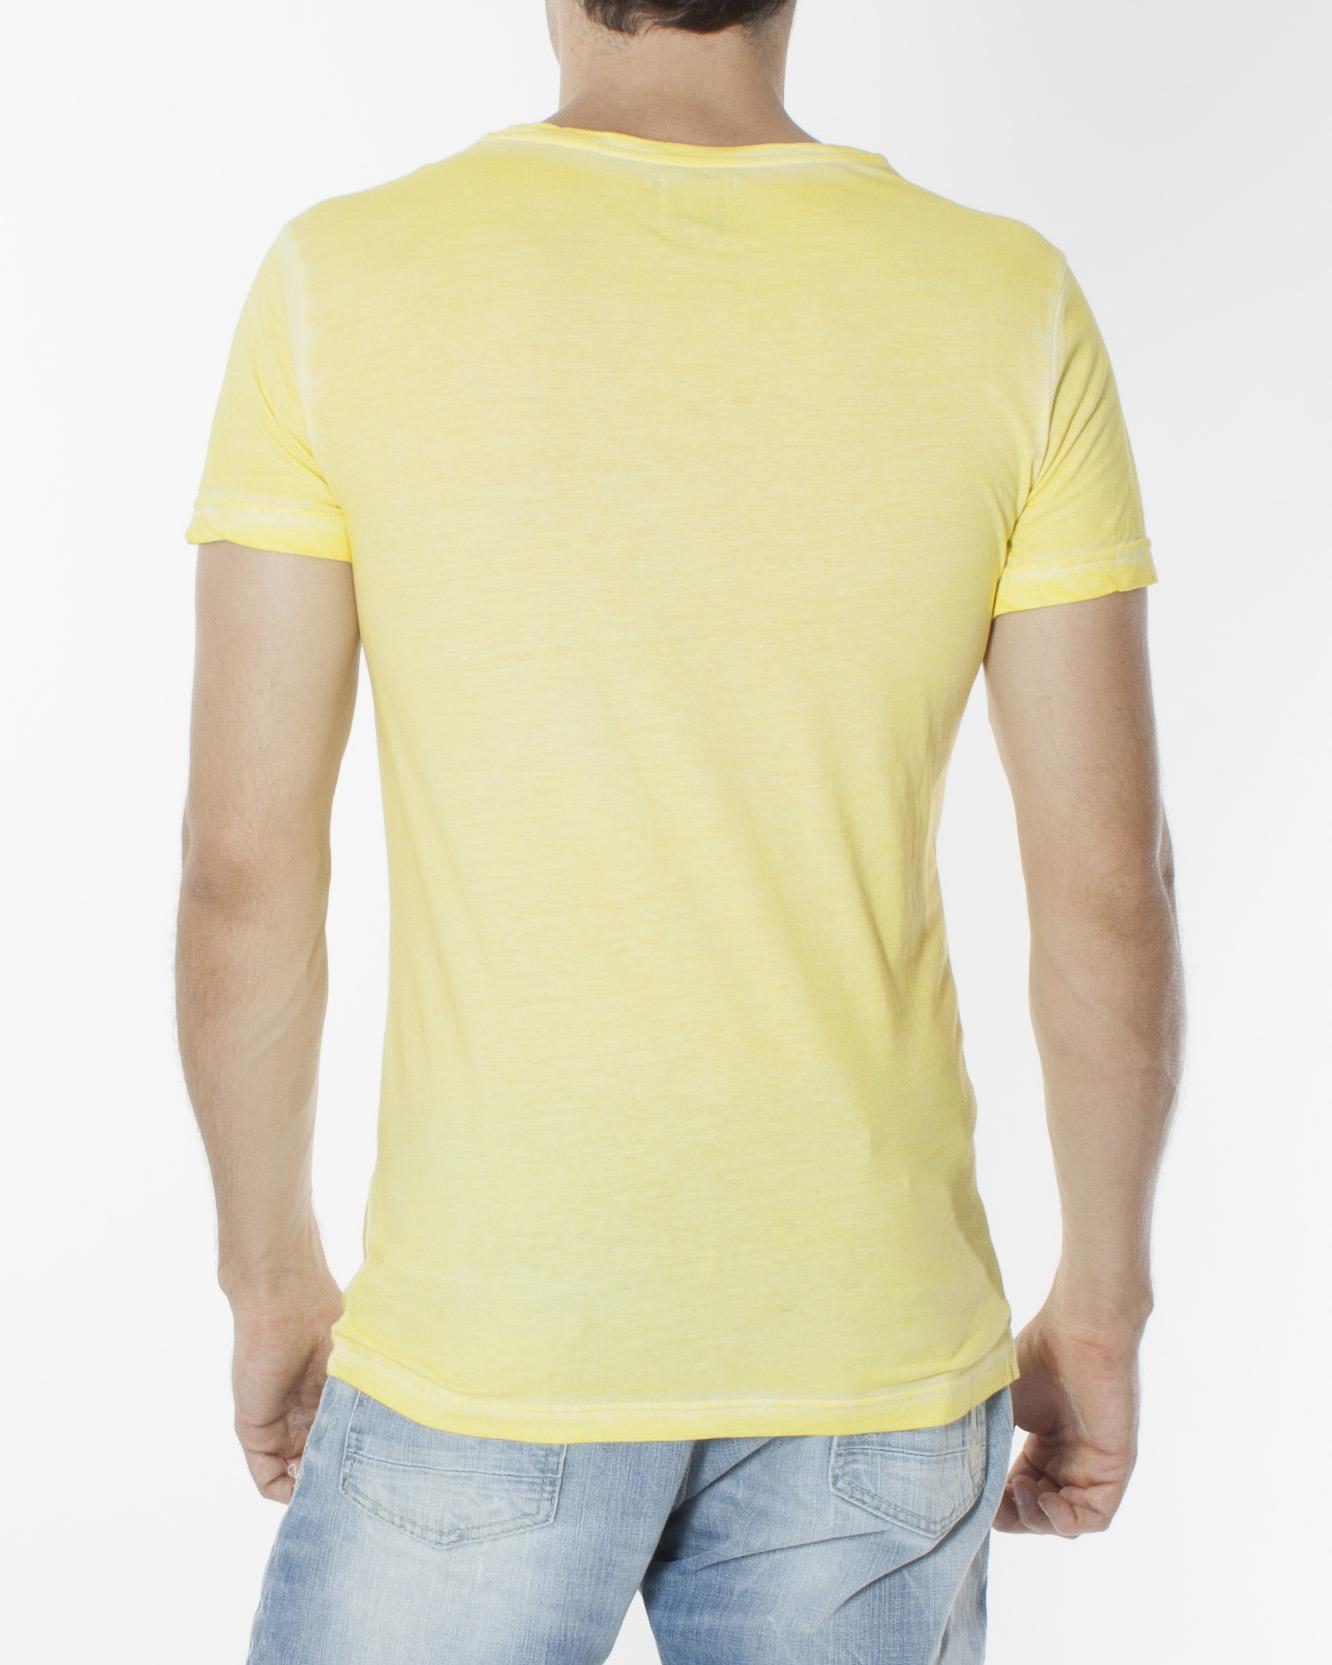 мужская футболка REIGN, сезон: лето 2012. Купить за 1300 руб. | Фото $i